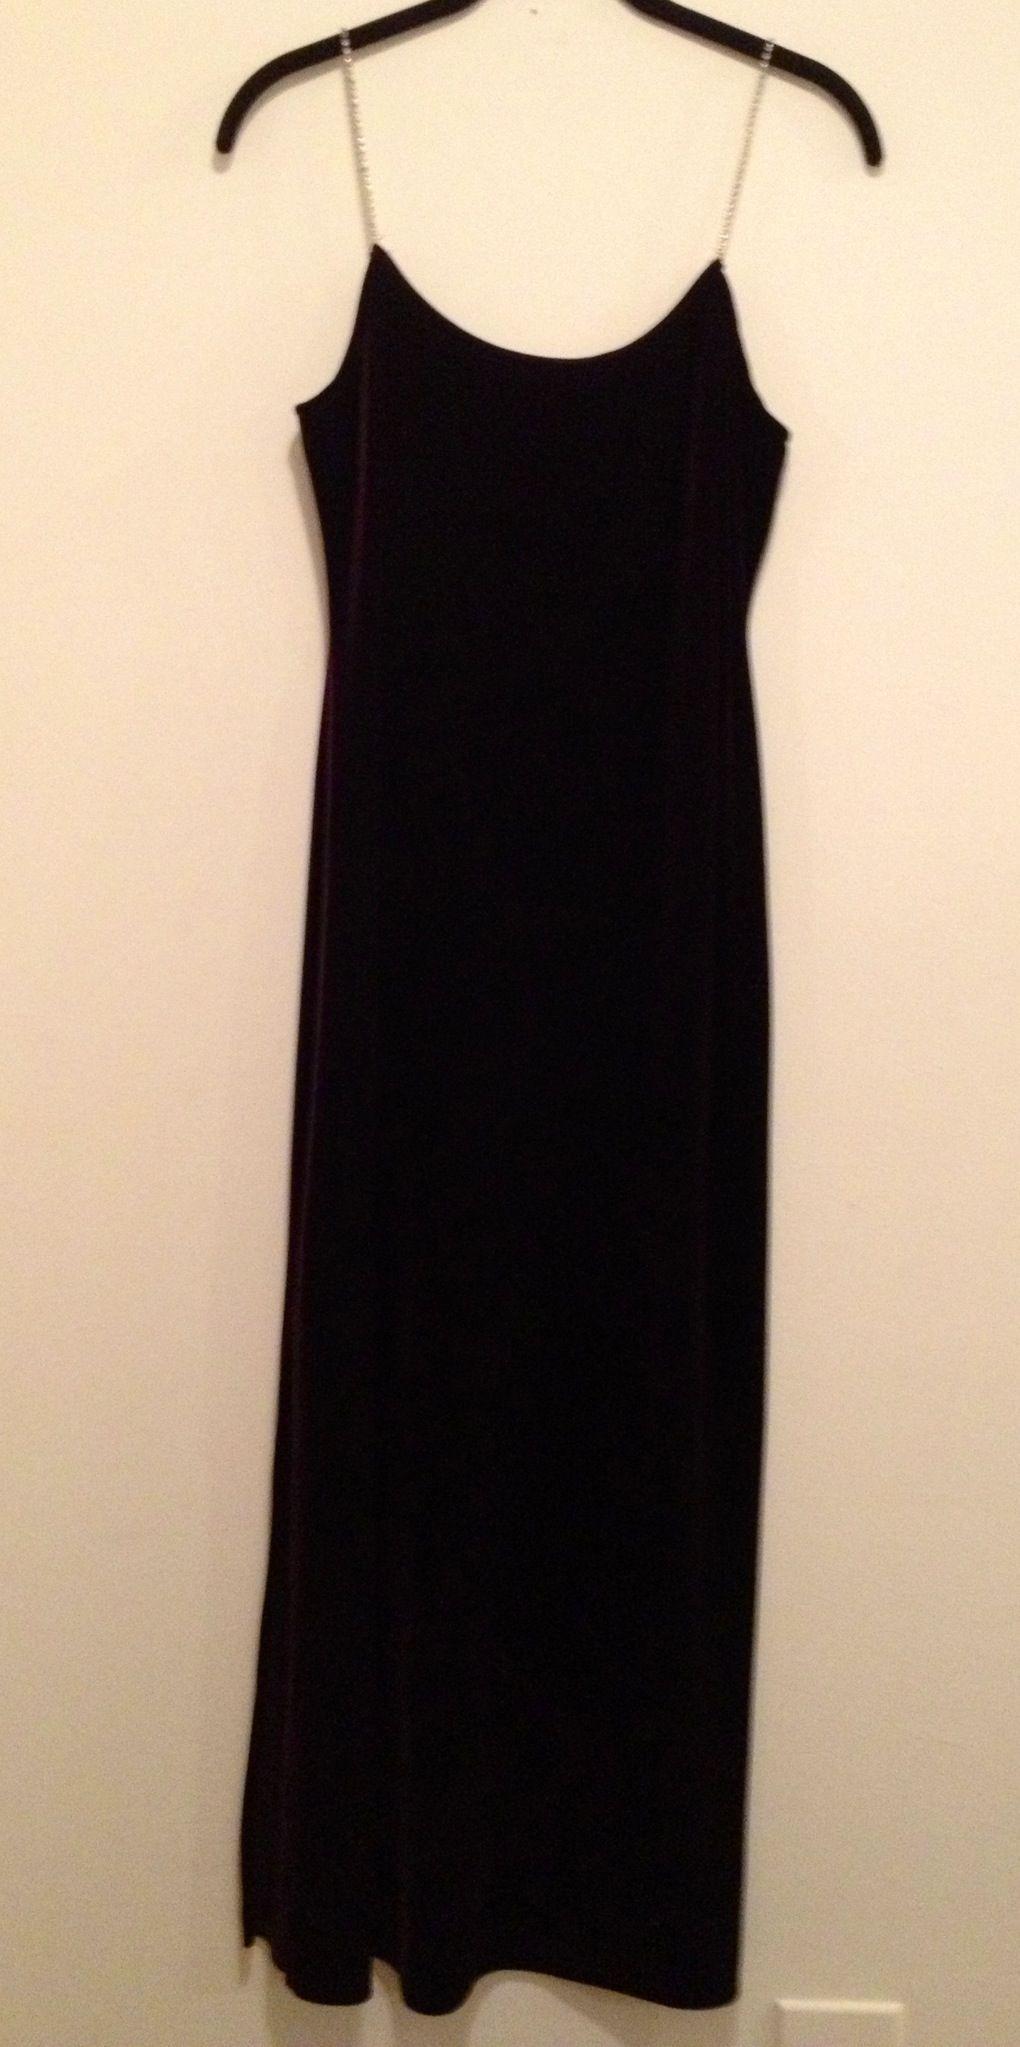 Park Art|My WordPress Blog_Black Dress With Slits On Both Sides